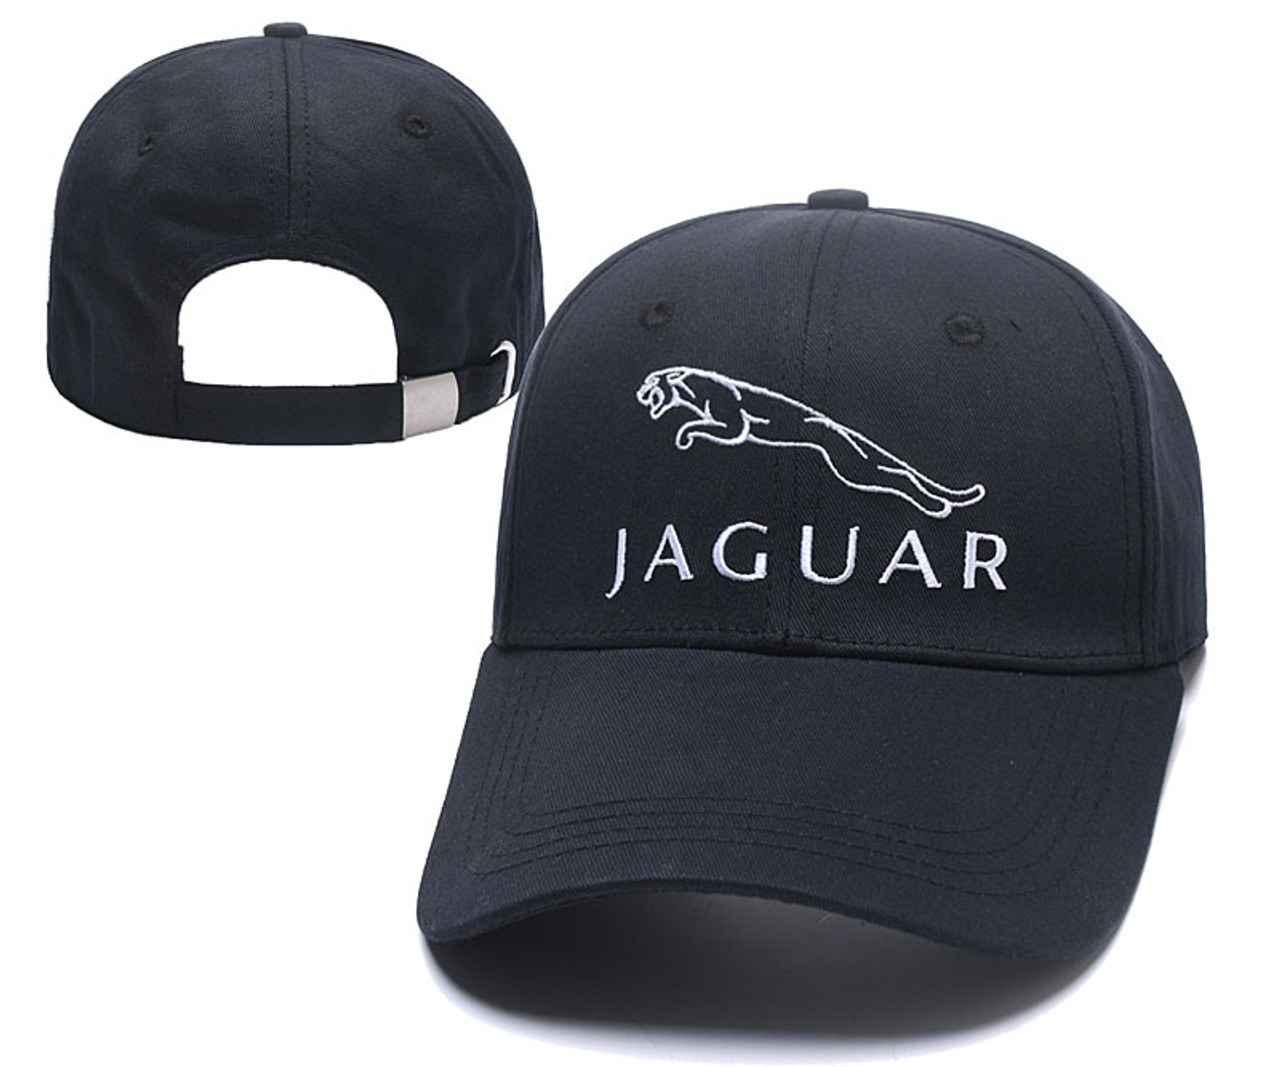 1298294f57b Jaguar car logo themed baseball Cap Embroidered Auto logo ajustable snapback  hood baseball cap